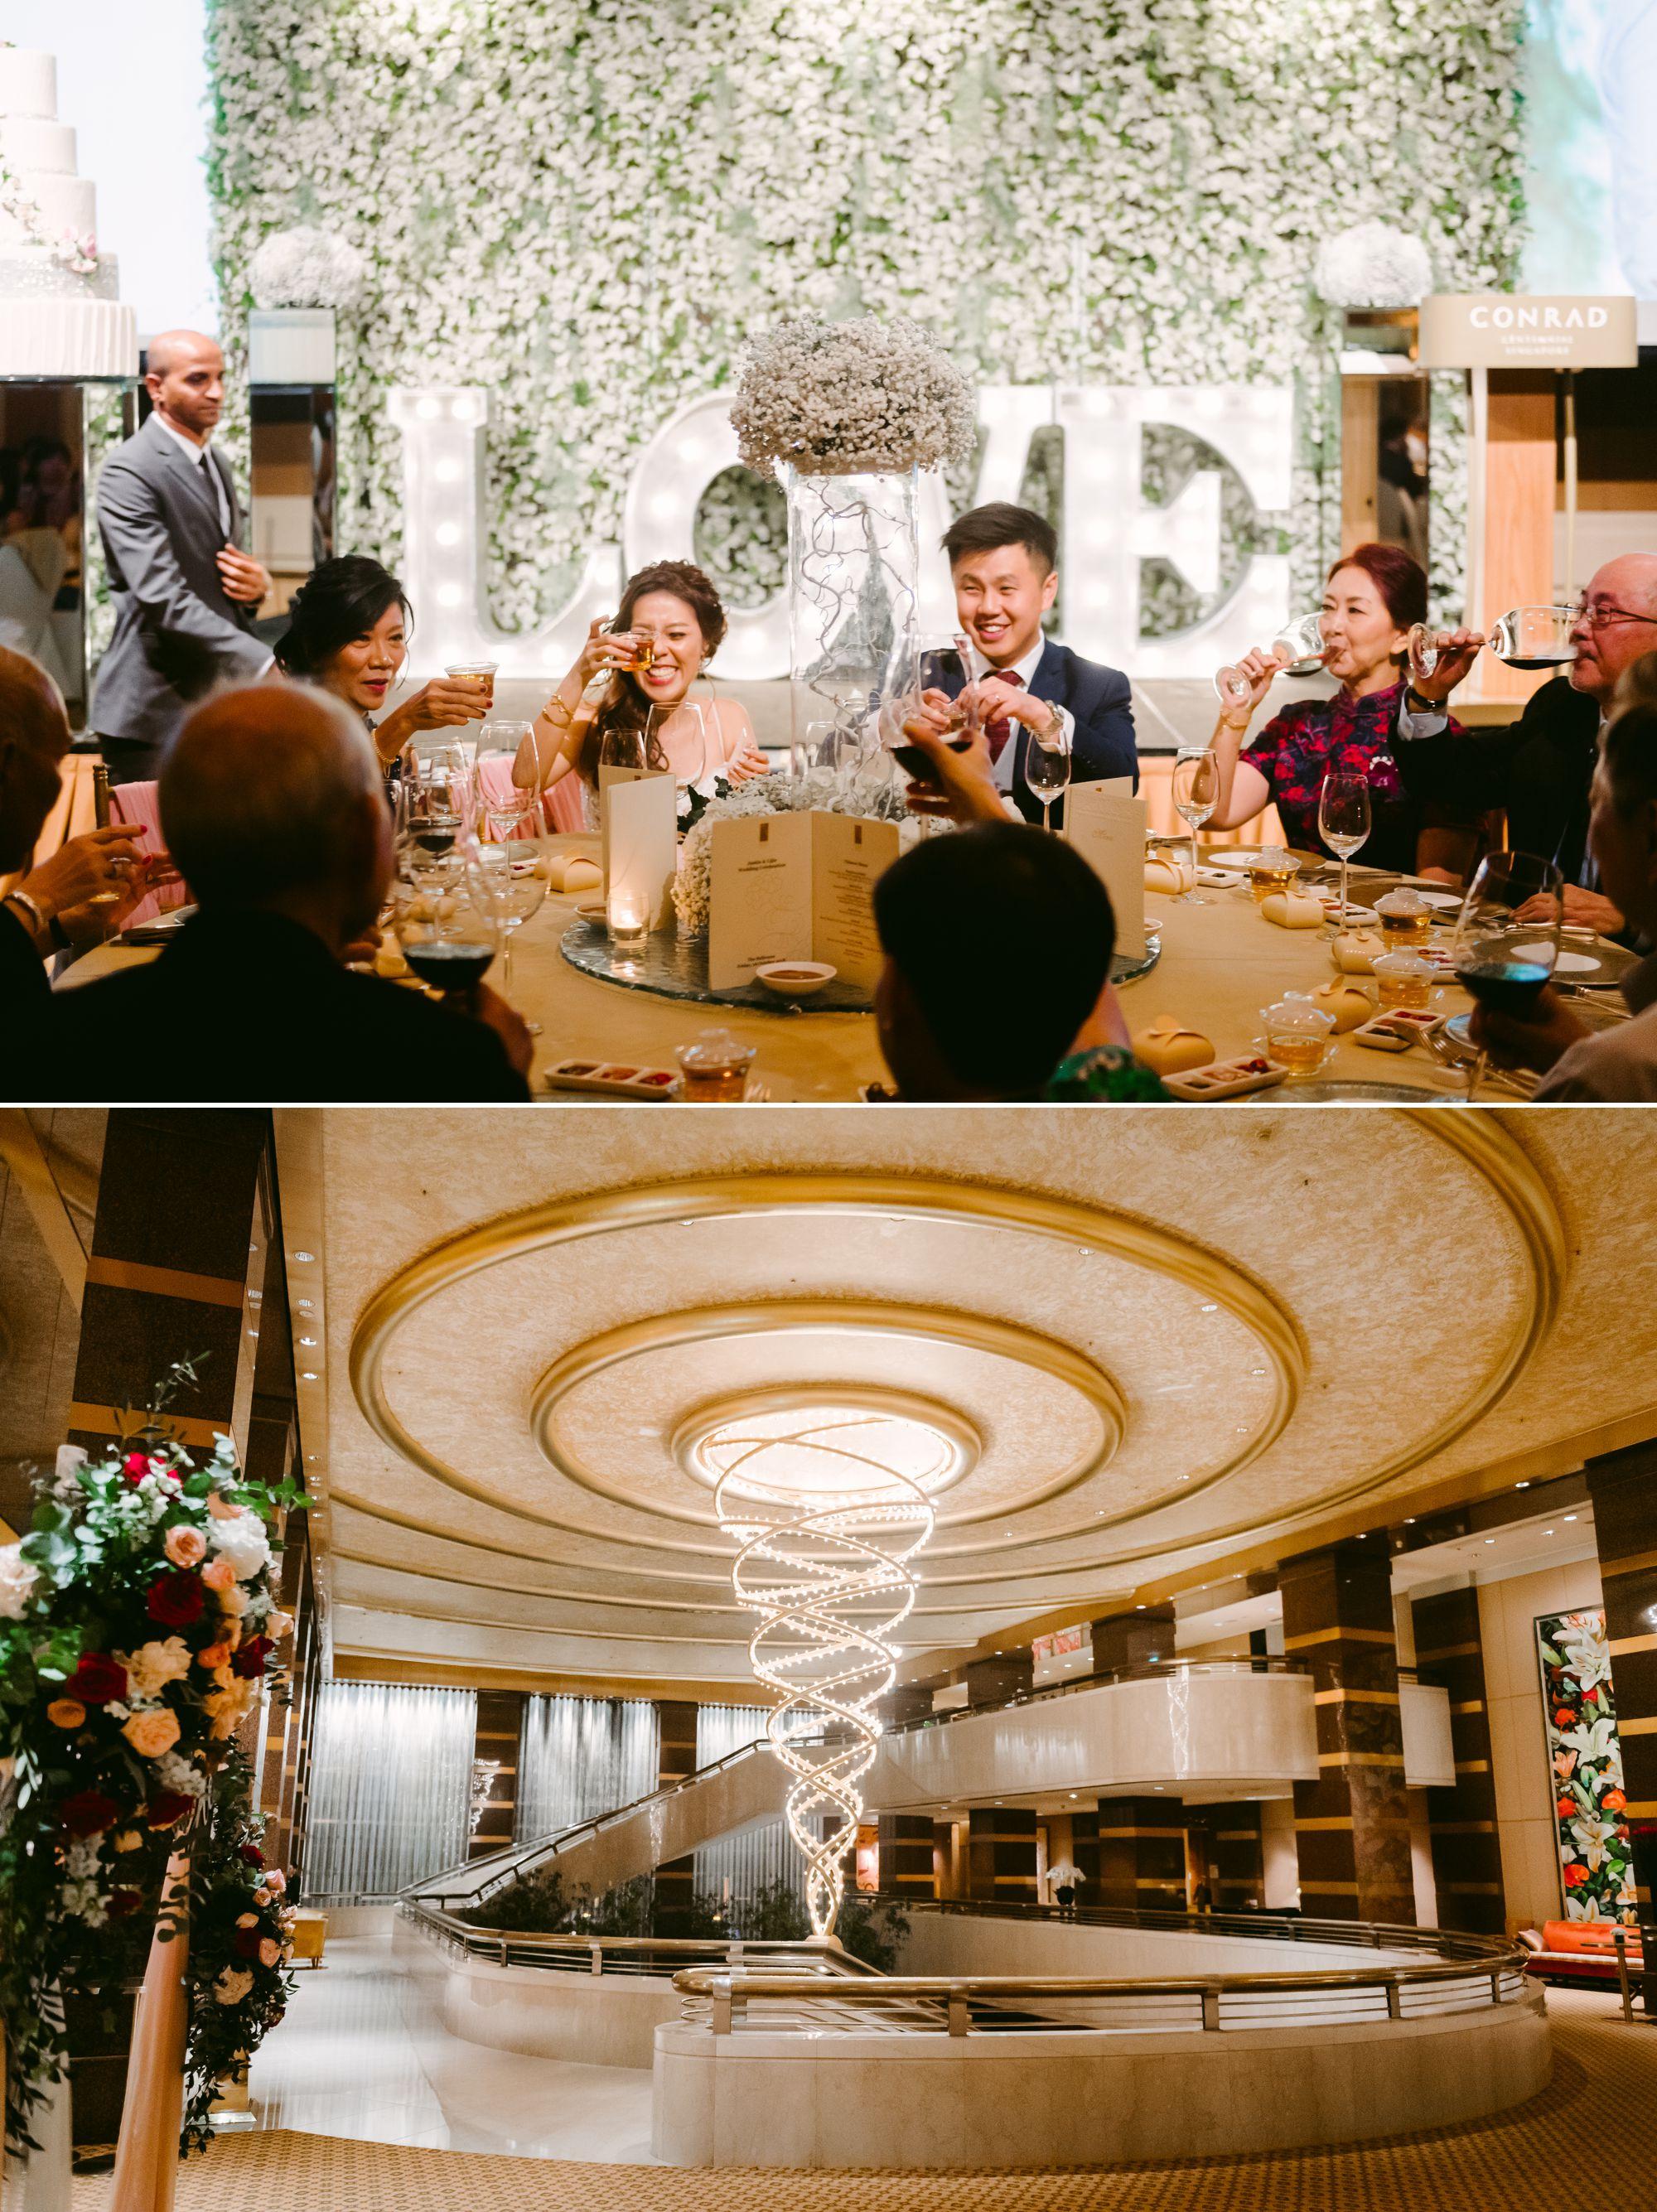 conrad_wedding_Singapore_ 35.jpg